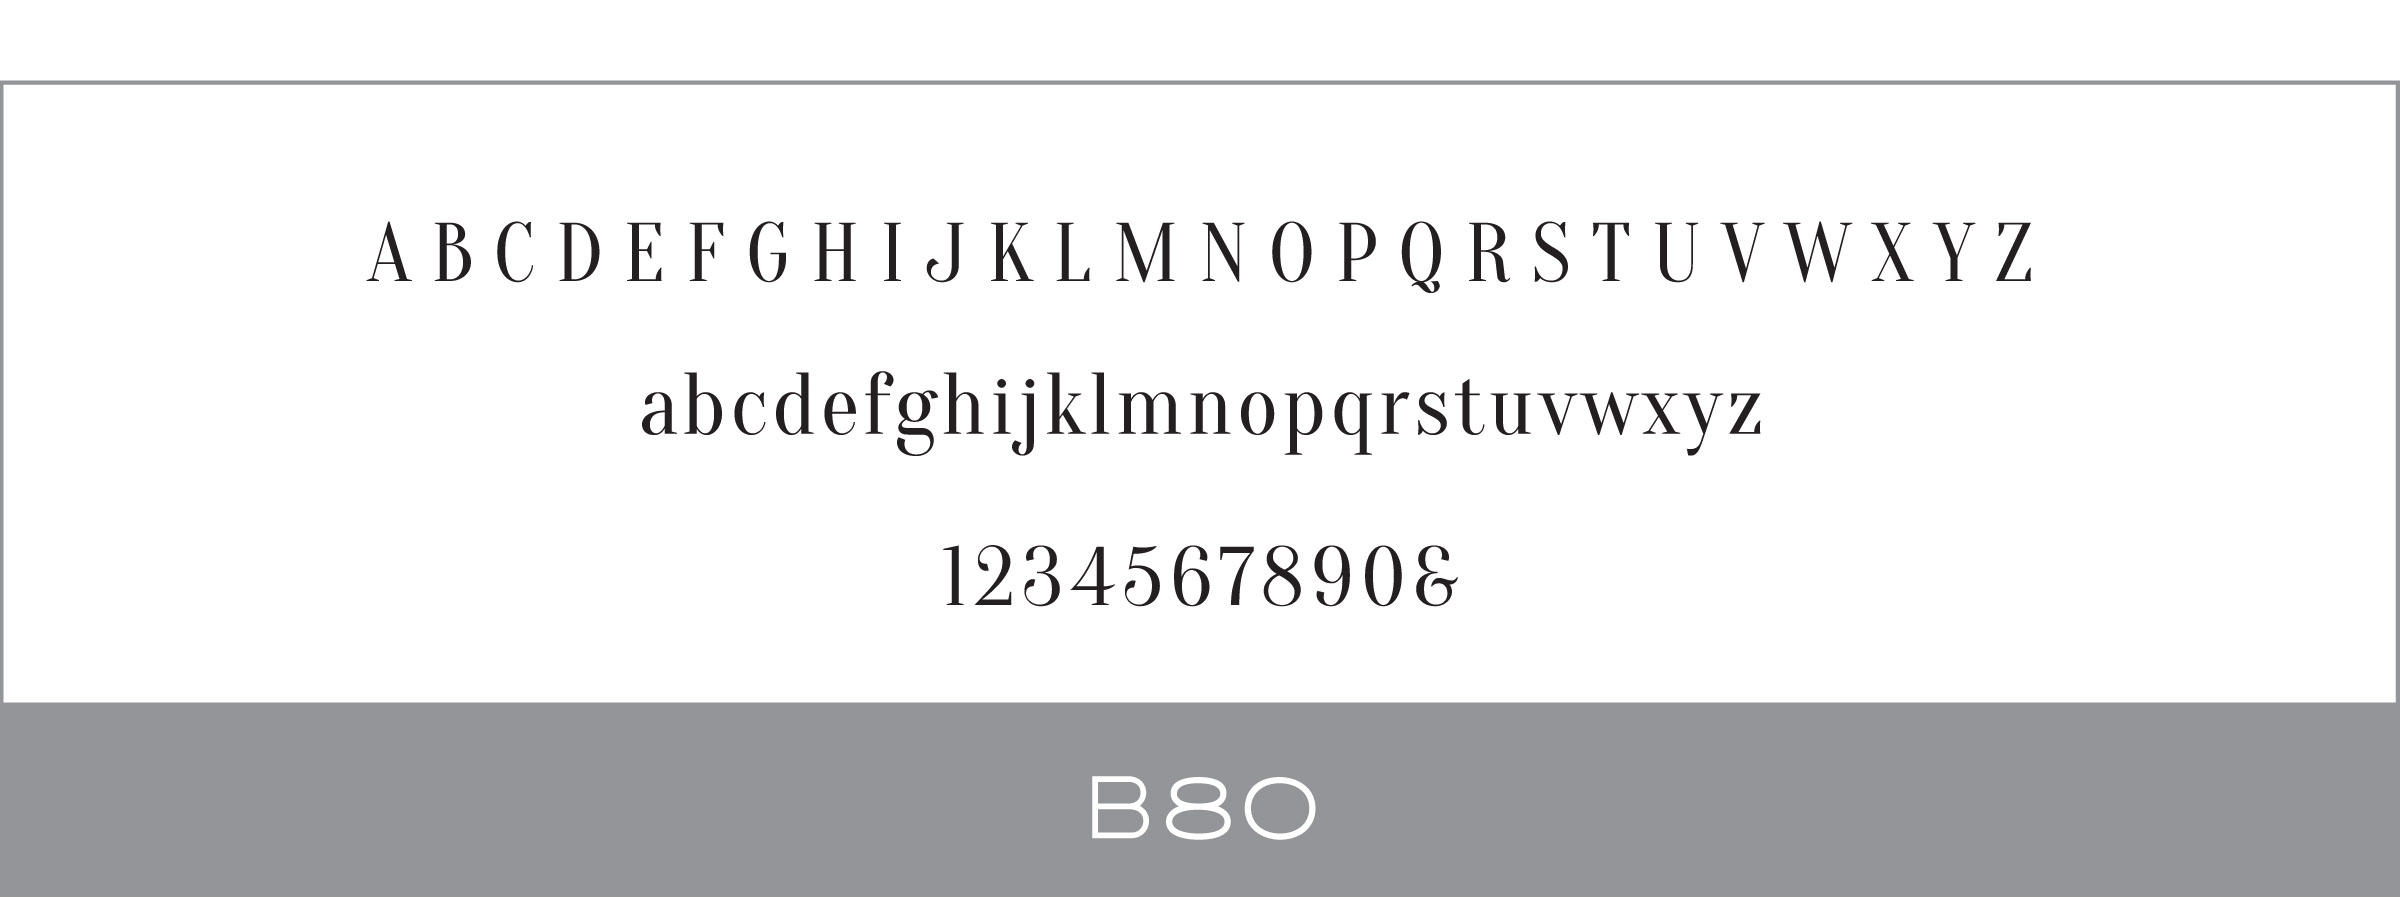 B80_Haute_Papier_Font.jpg